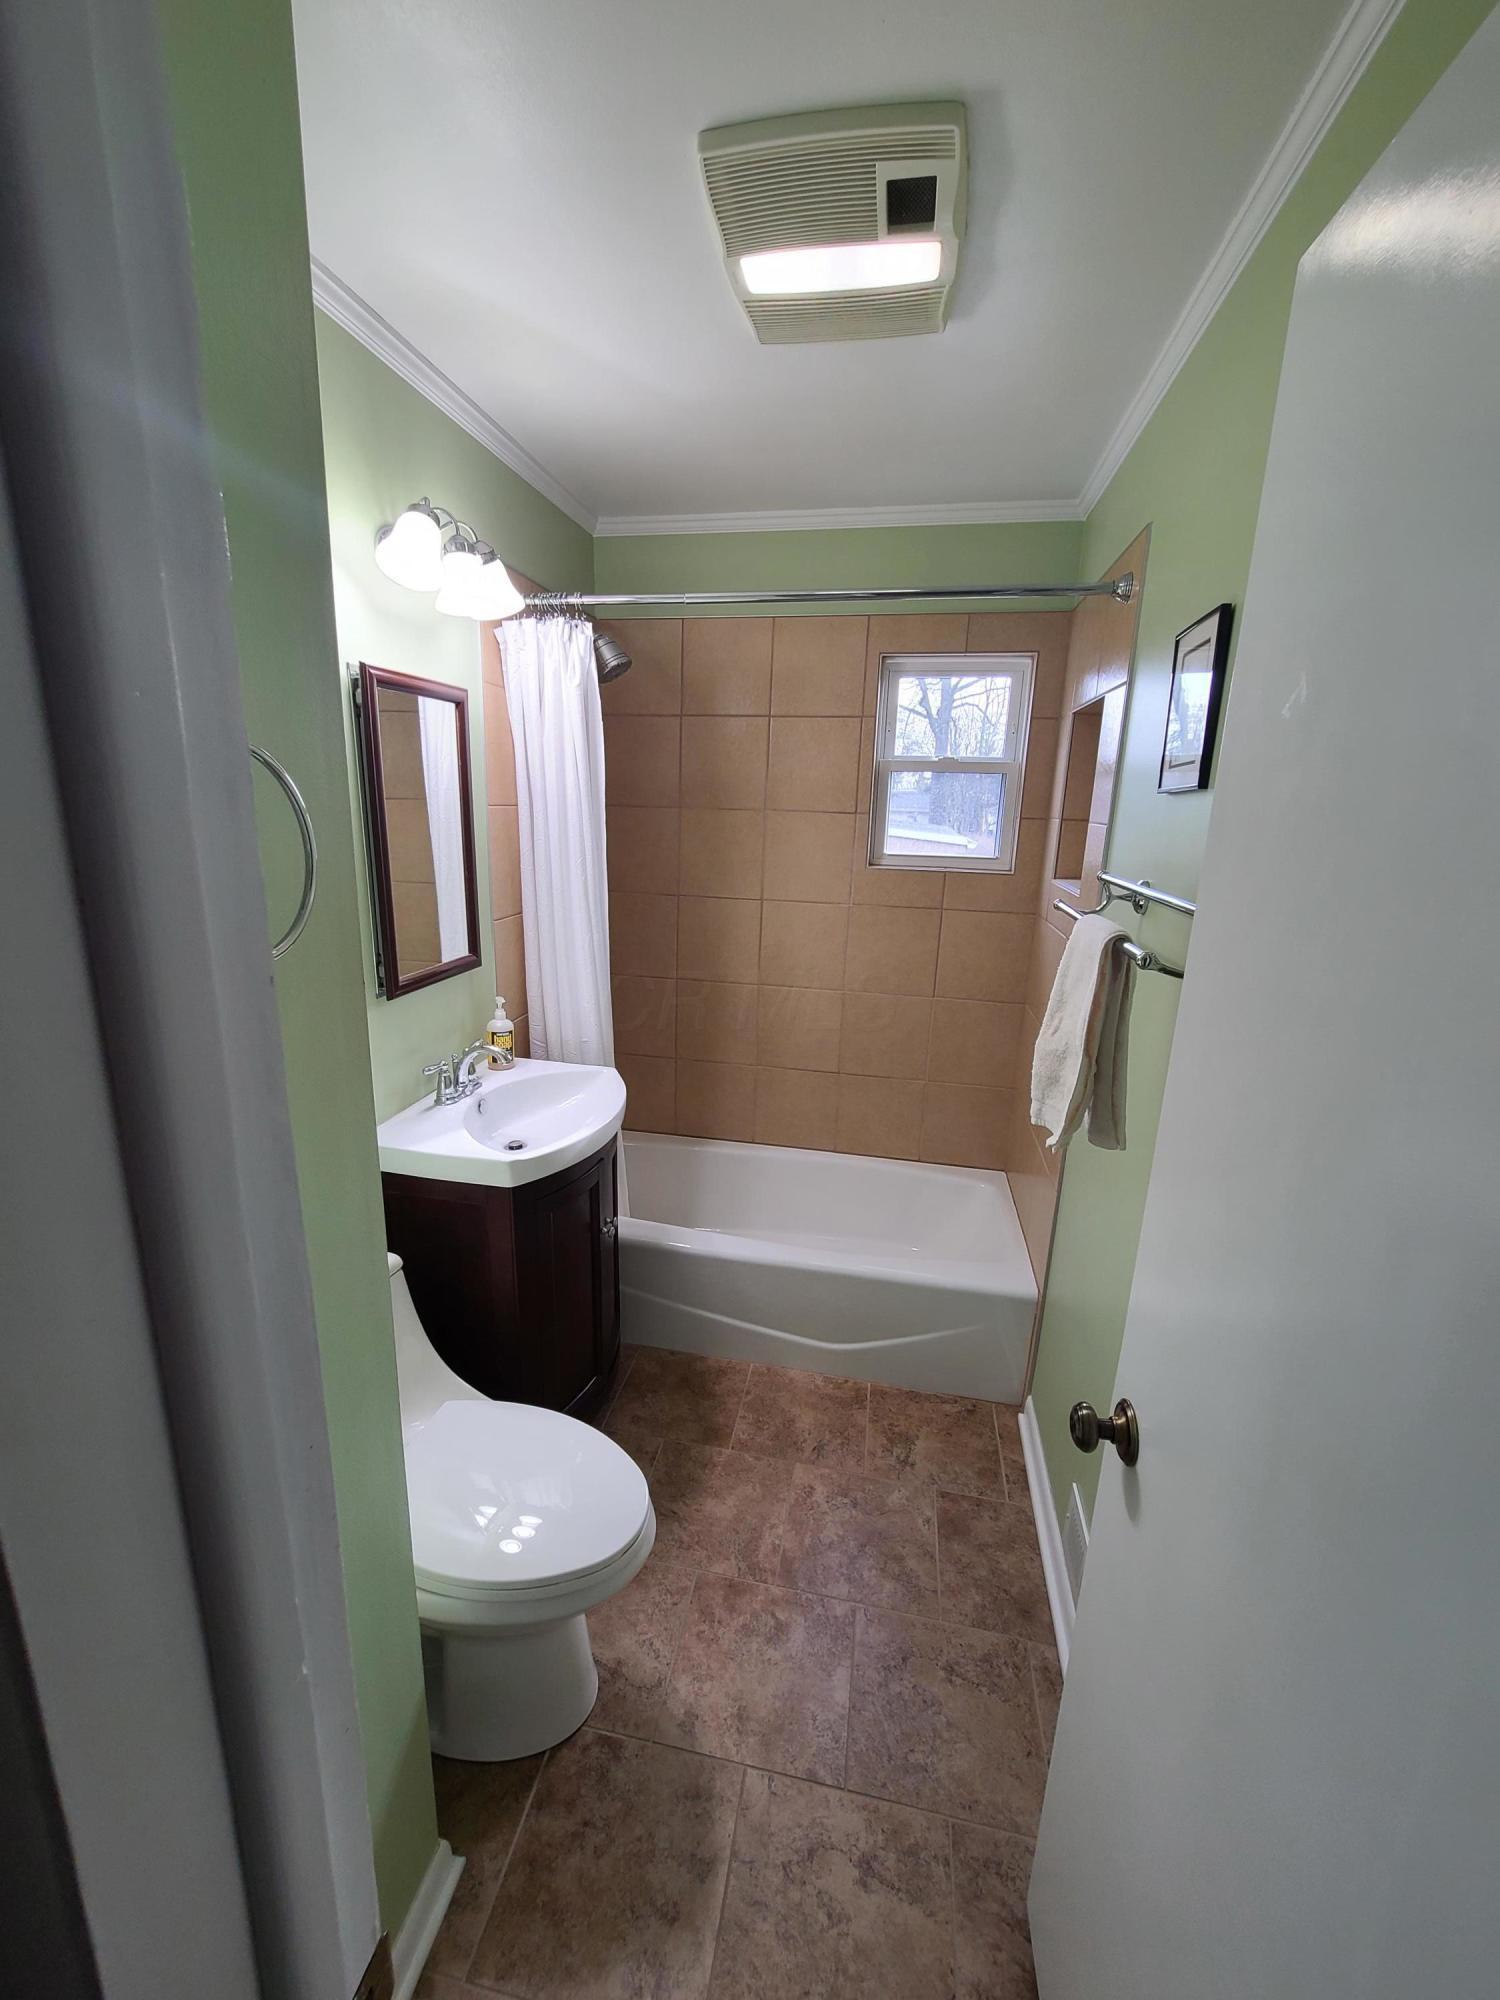 1233 Northridge Road, Columbus, Ohio 43224, 2 Bedrooms Bedrooms, ,1 BathroomBathrooms,Residential,For Sale,Northridge,221001146